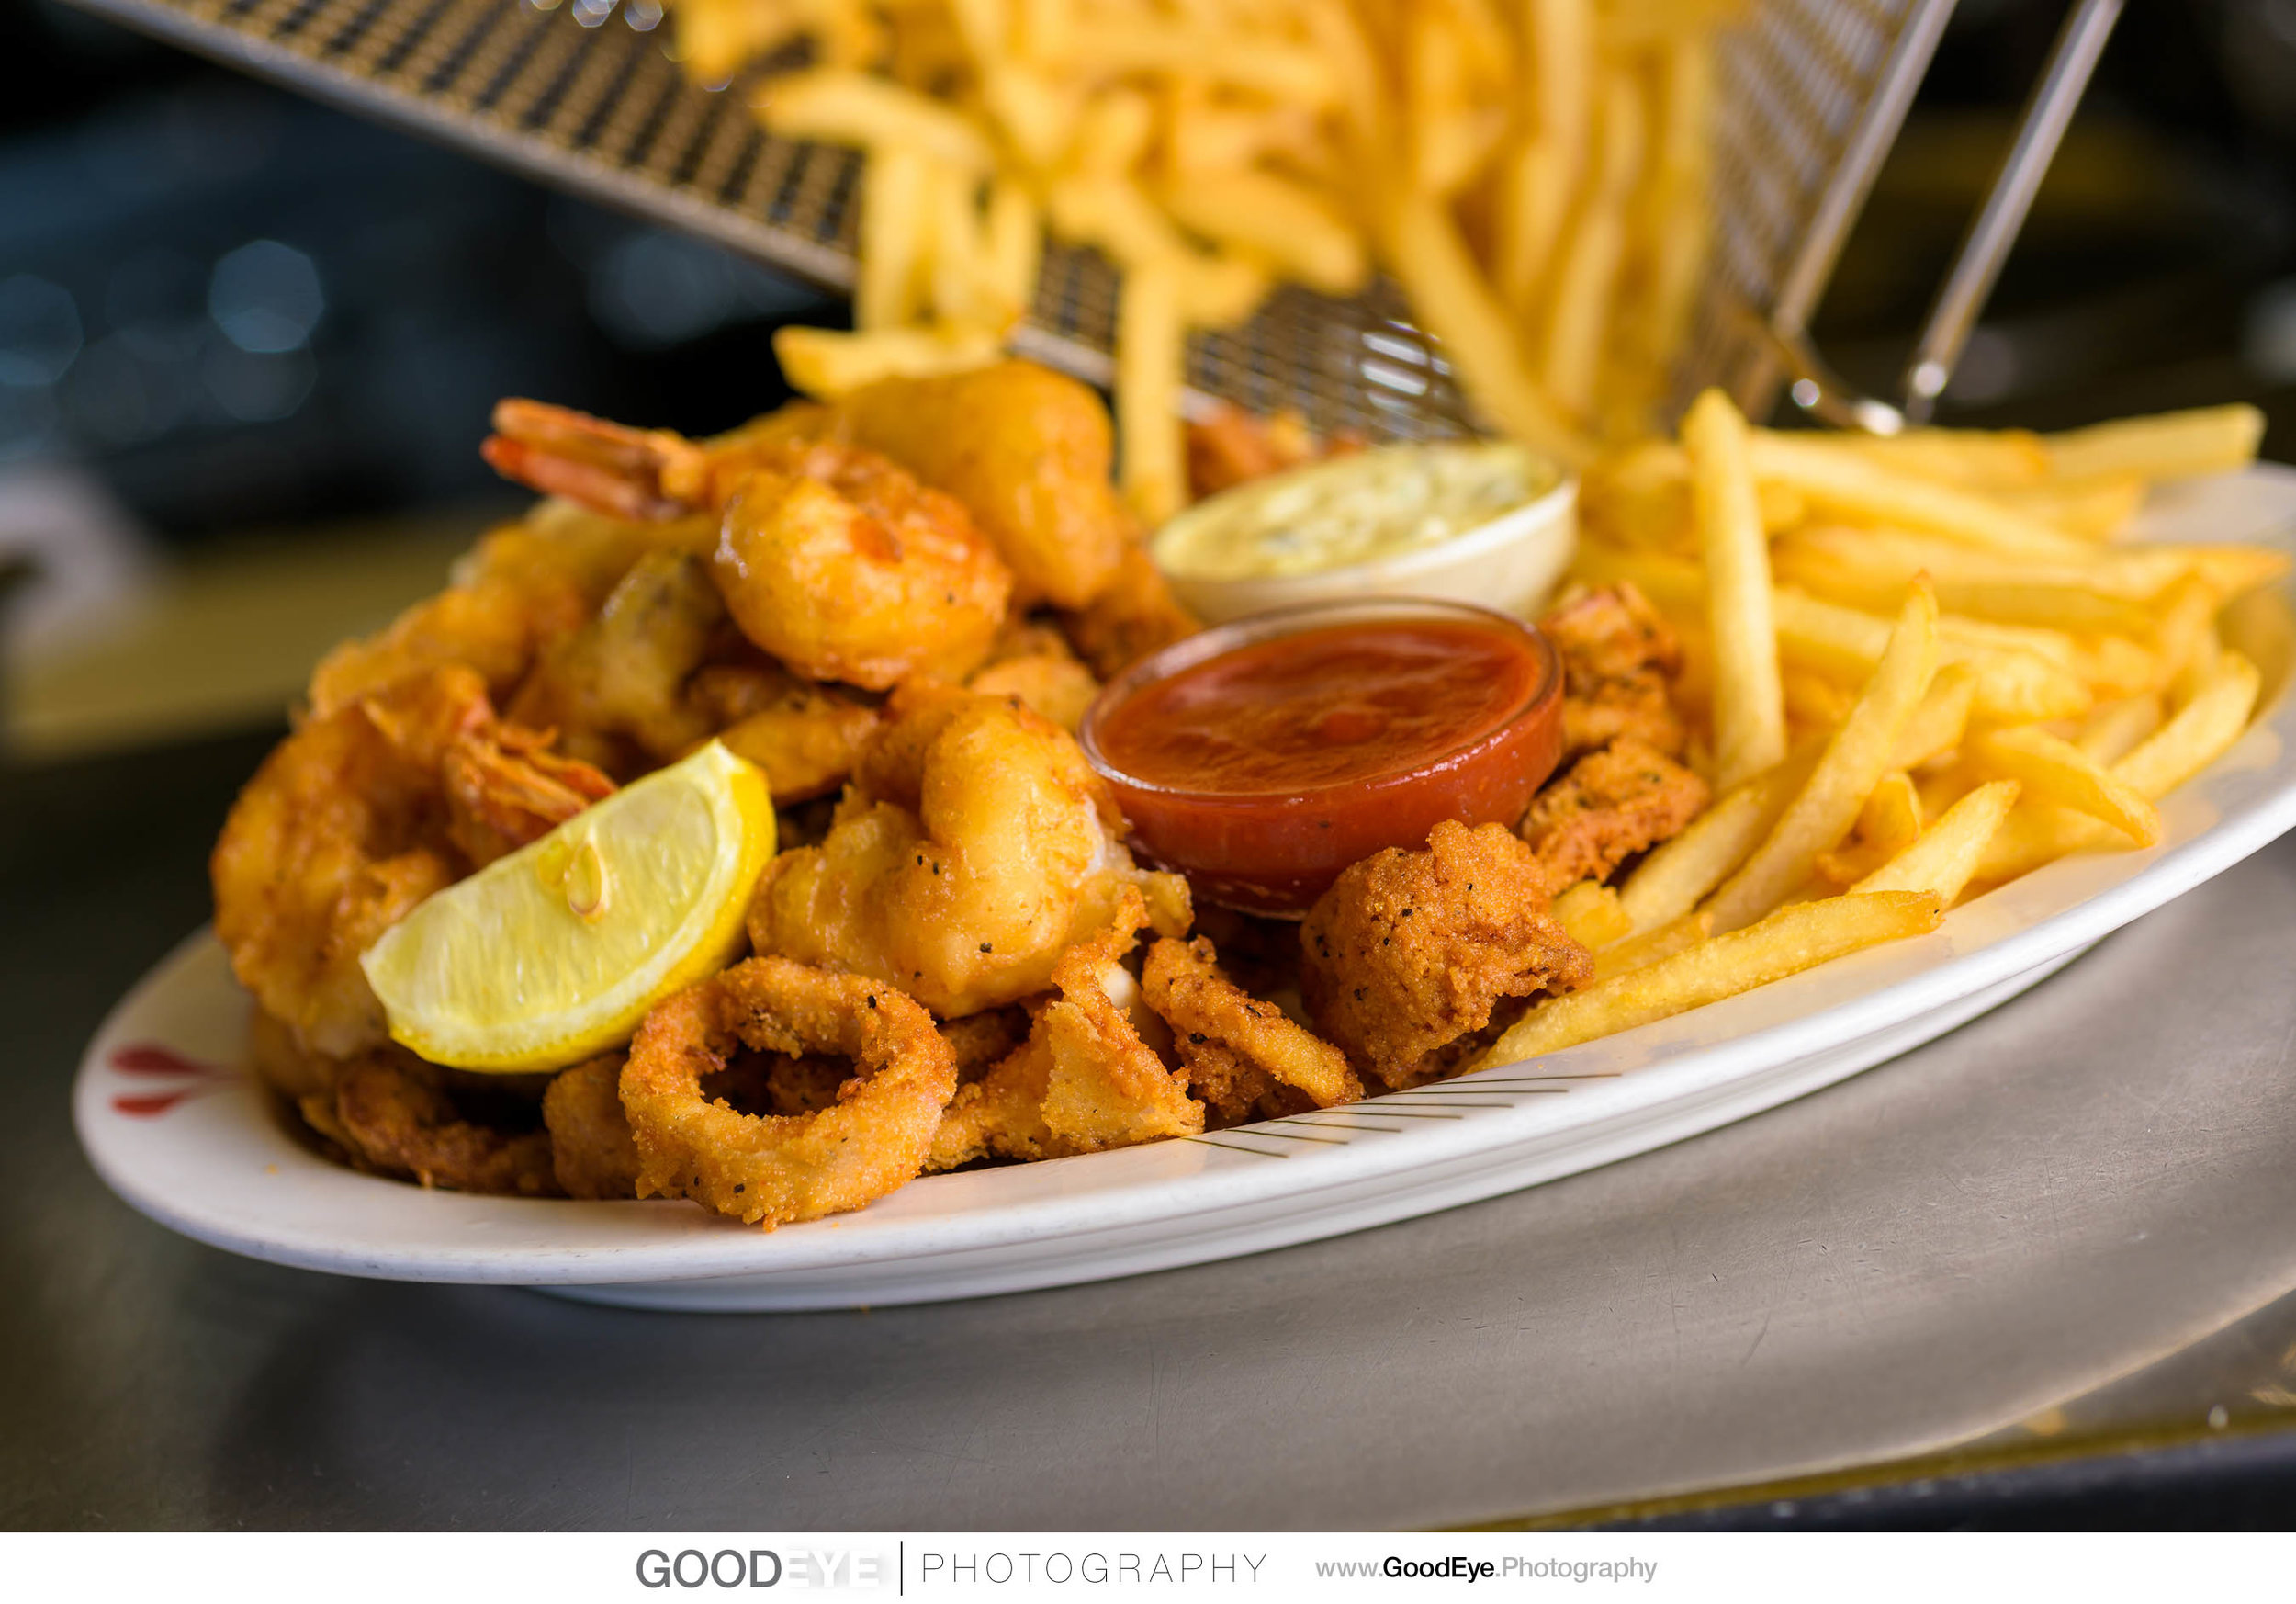 6165_Cafe_8_Aliotos_San_Francisco_Food_Photography_web.jpg